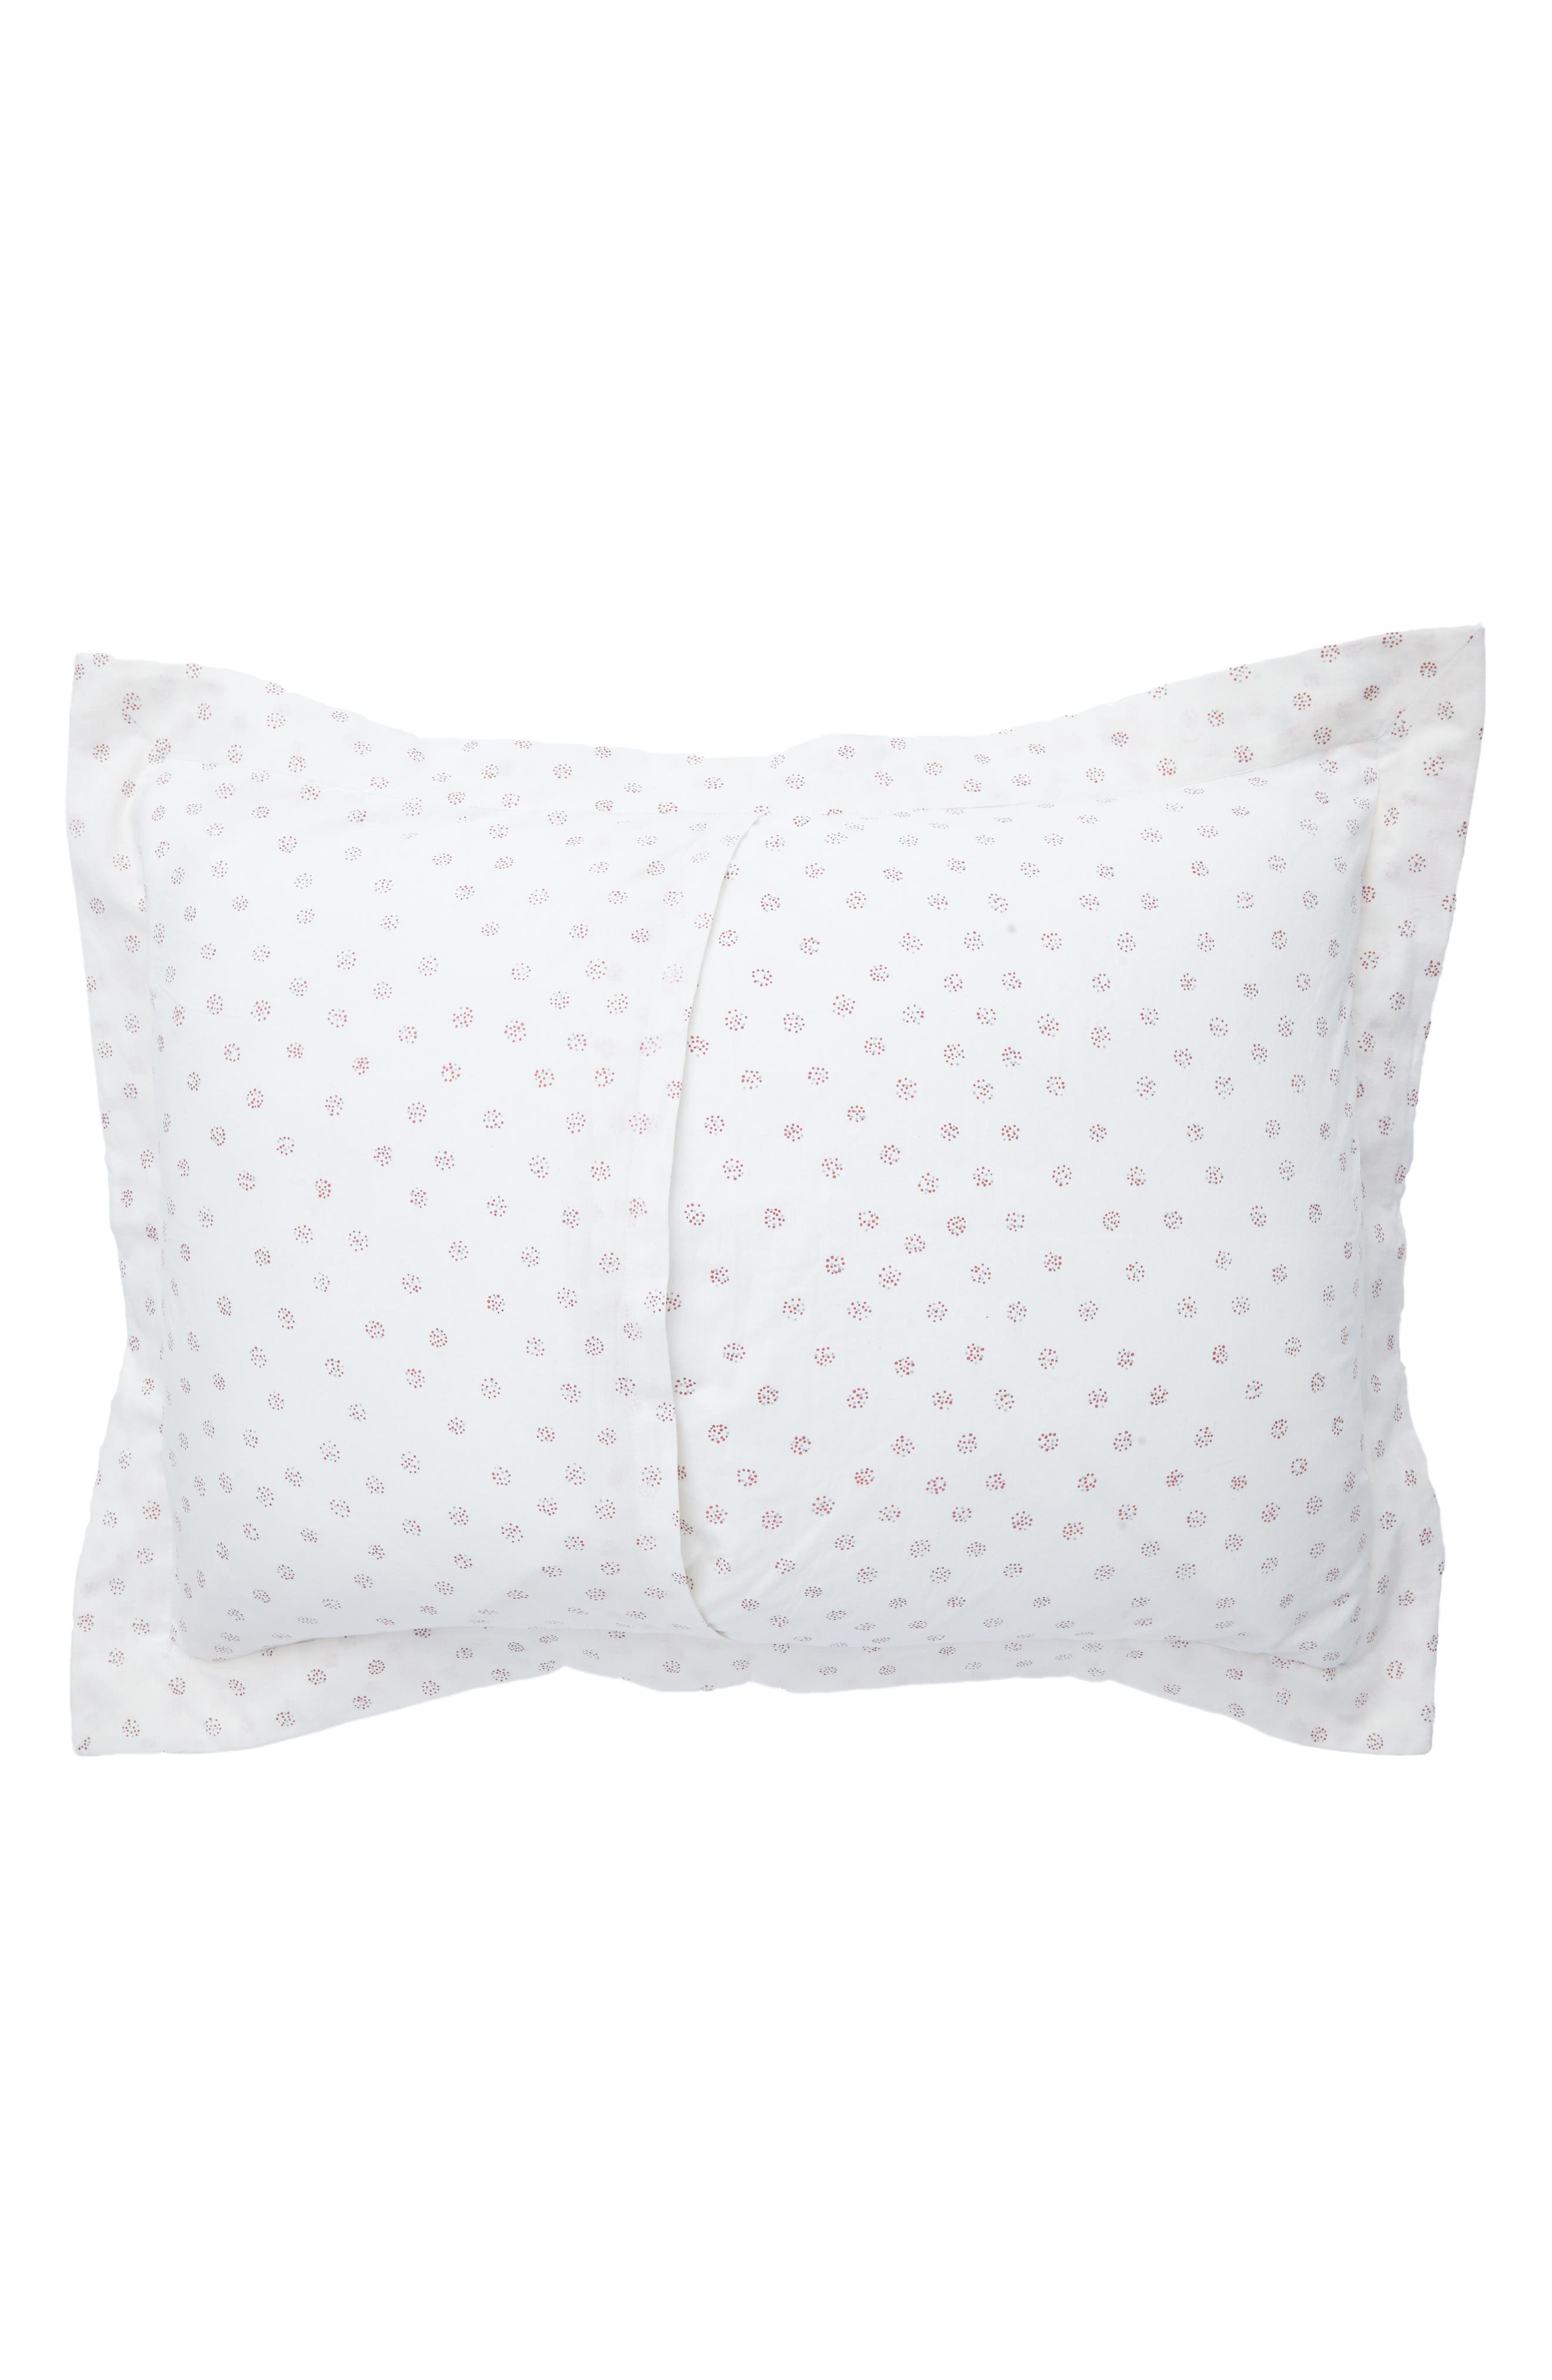 Reversible Standard Pillow Sham,                             Alternate thumbnail 2, color,                             PINK